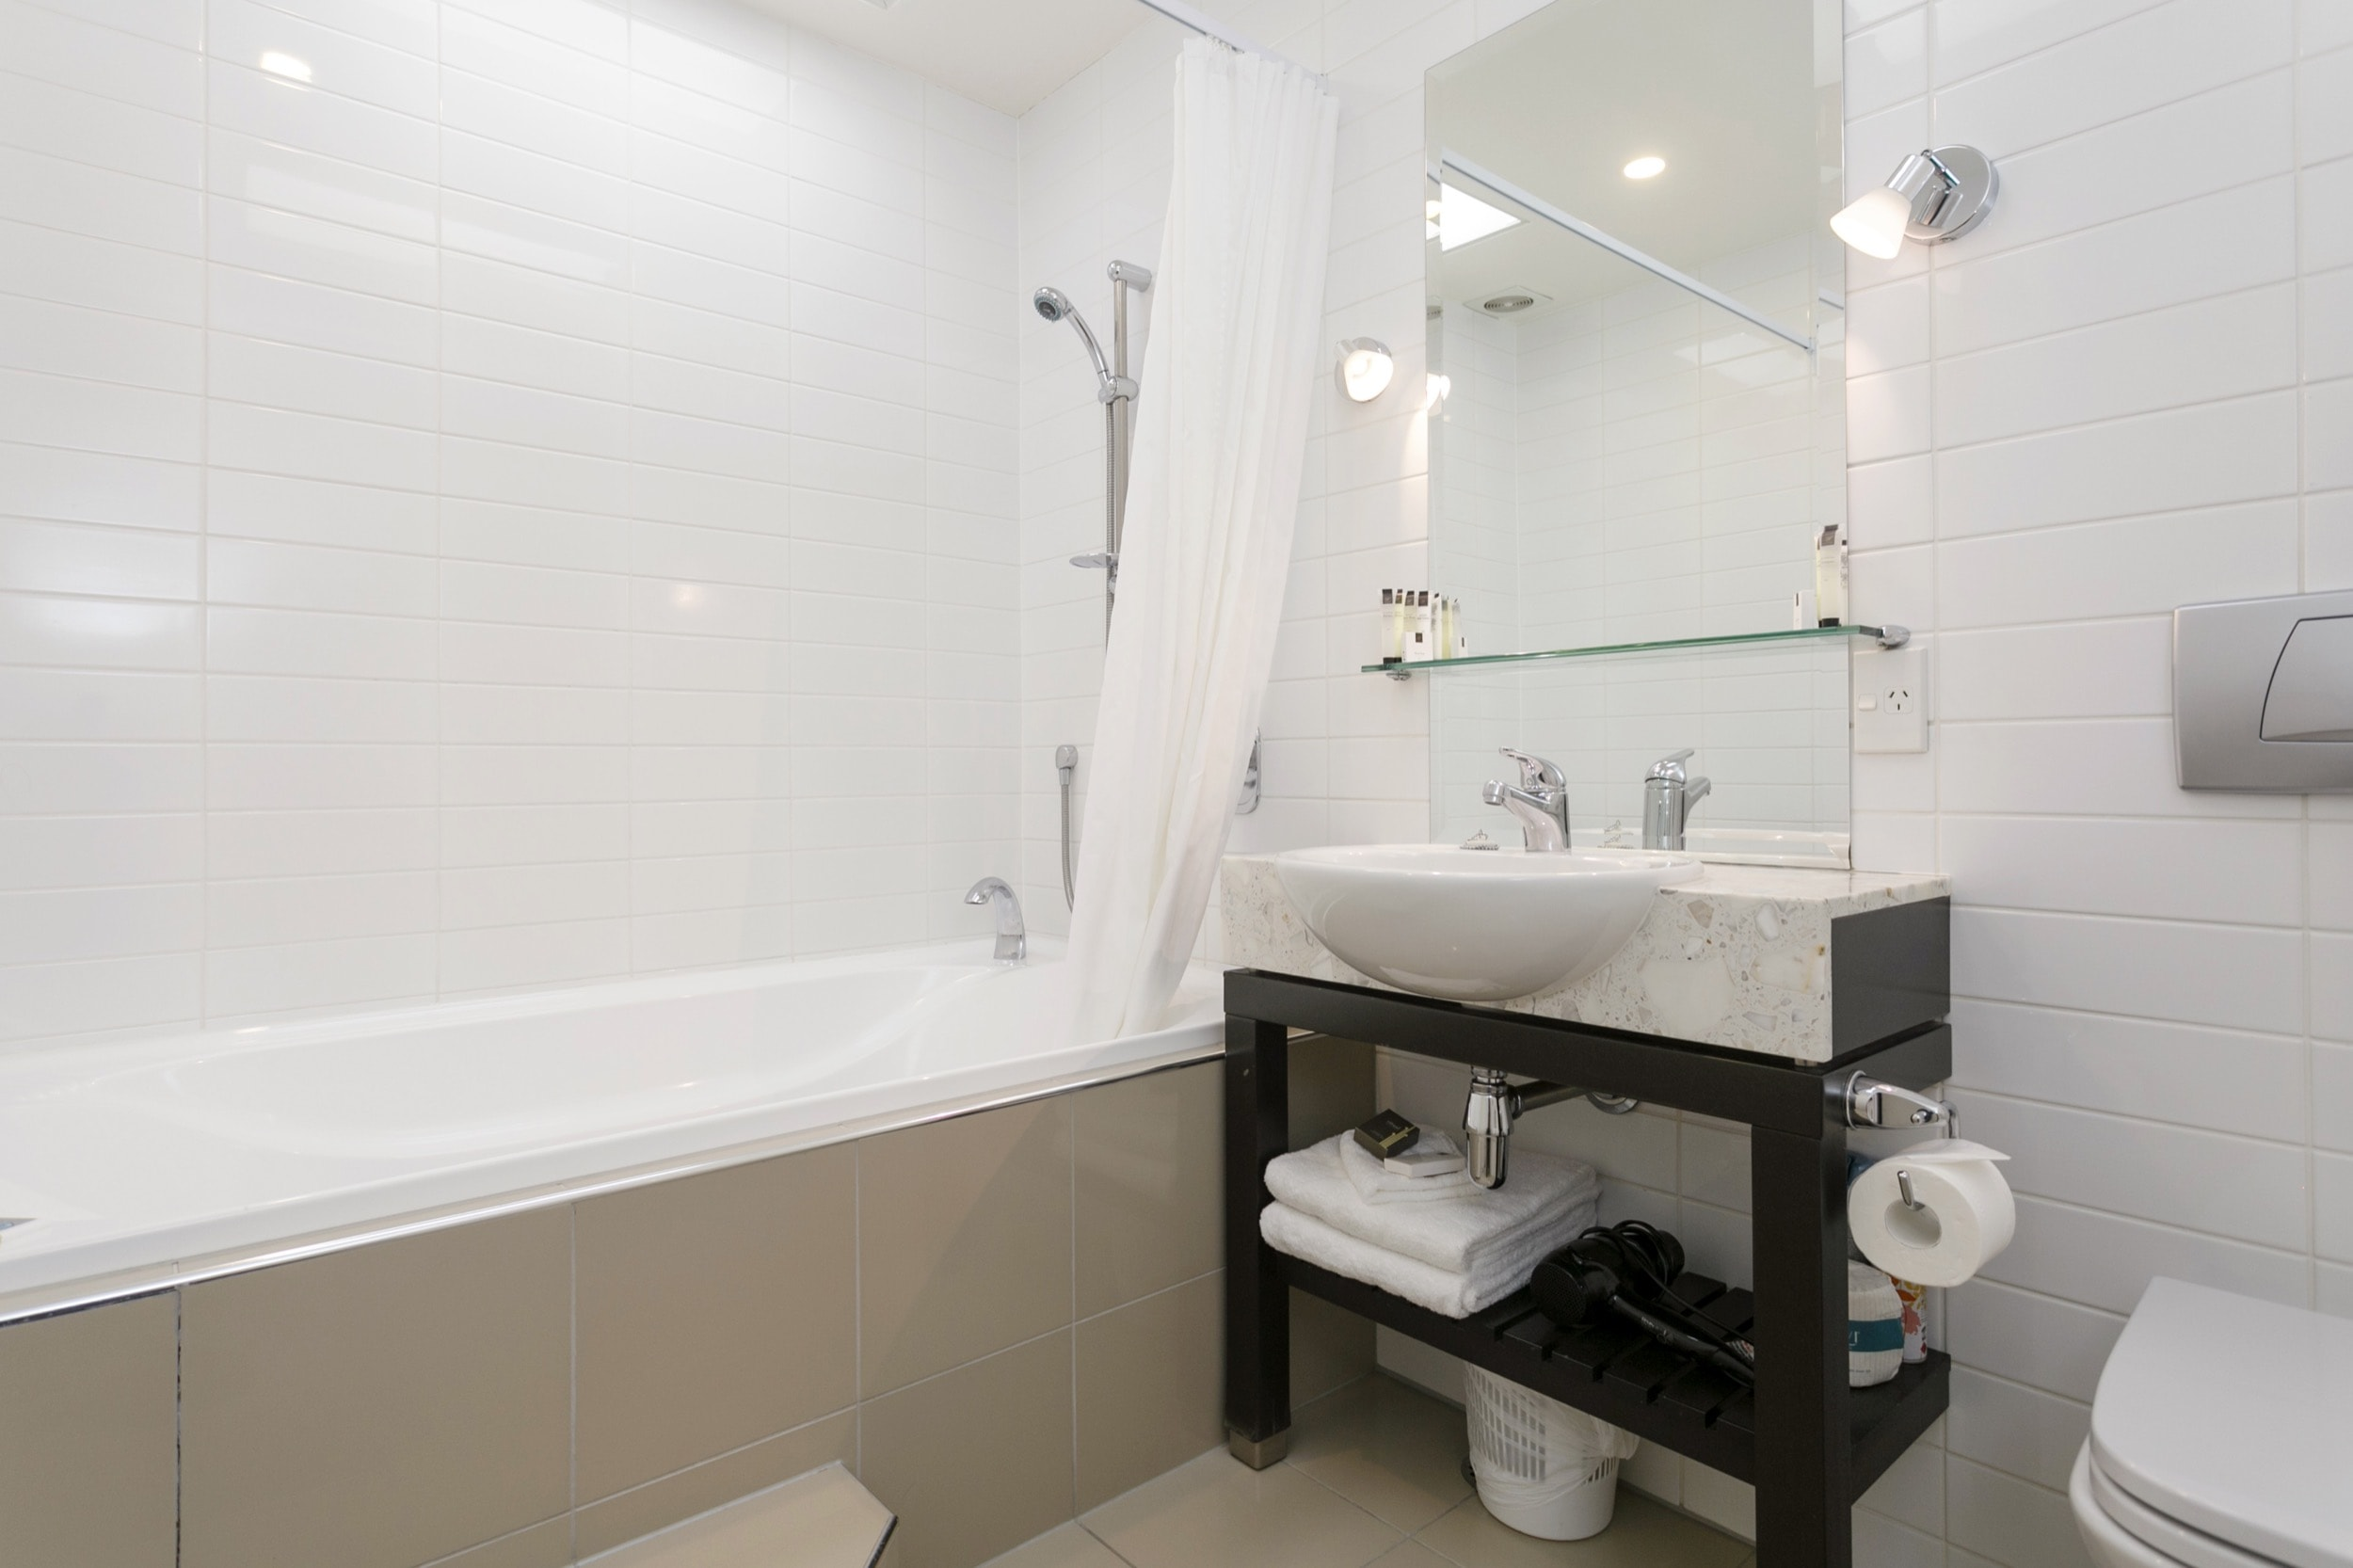 Studio no lake views bathroom with spa bath-min.jpg